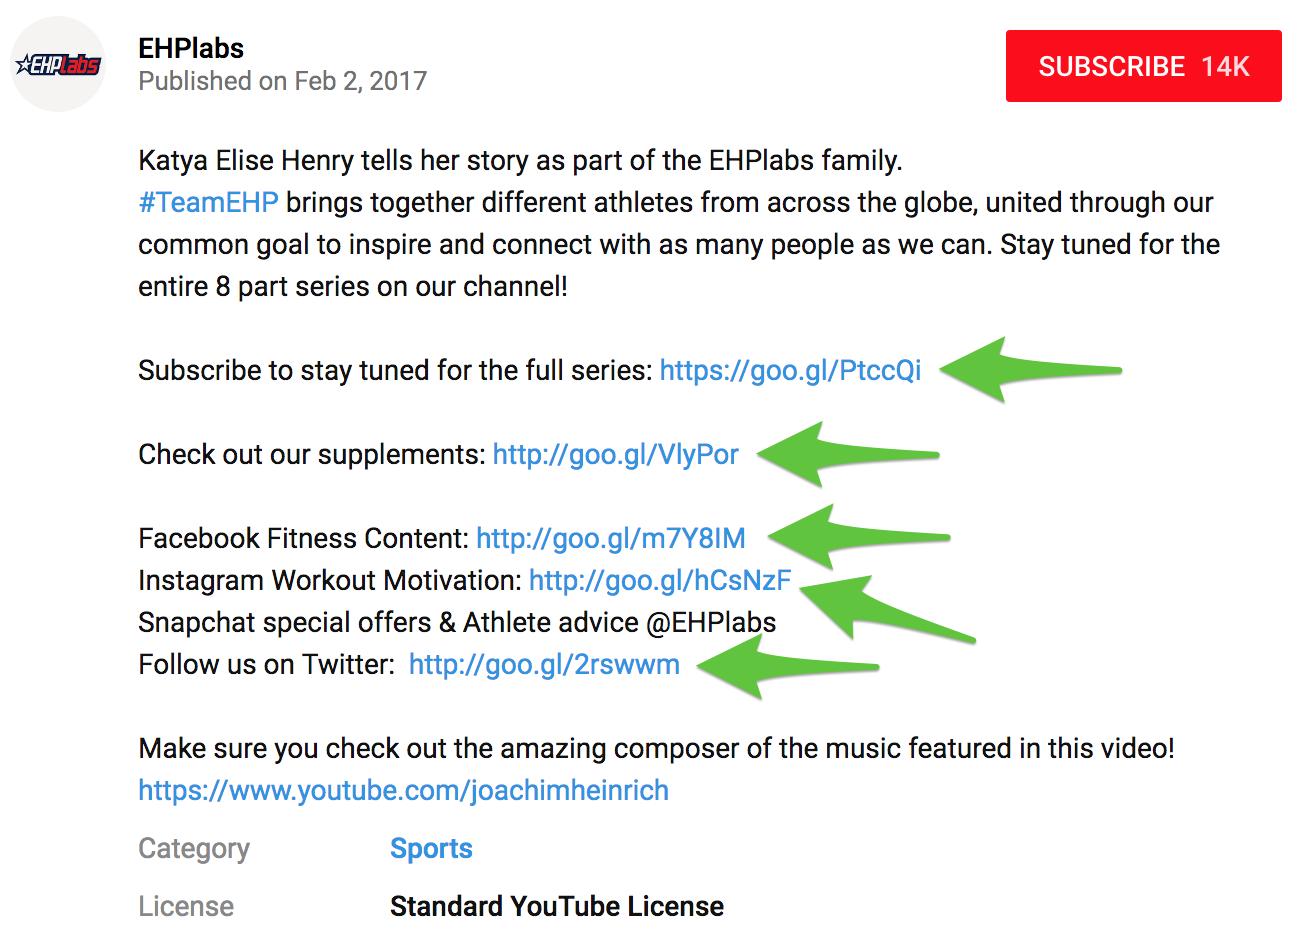 Screenshot showing a youtube video description